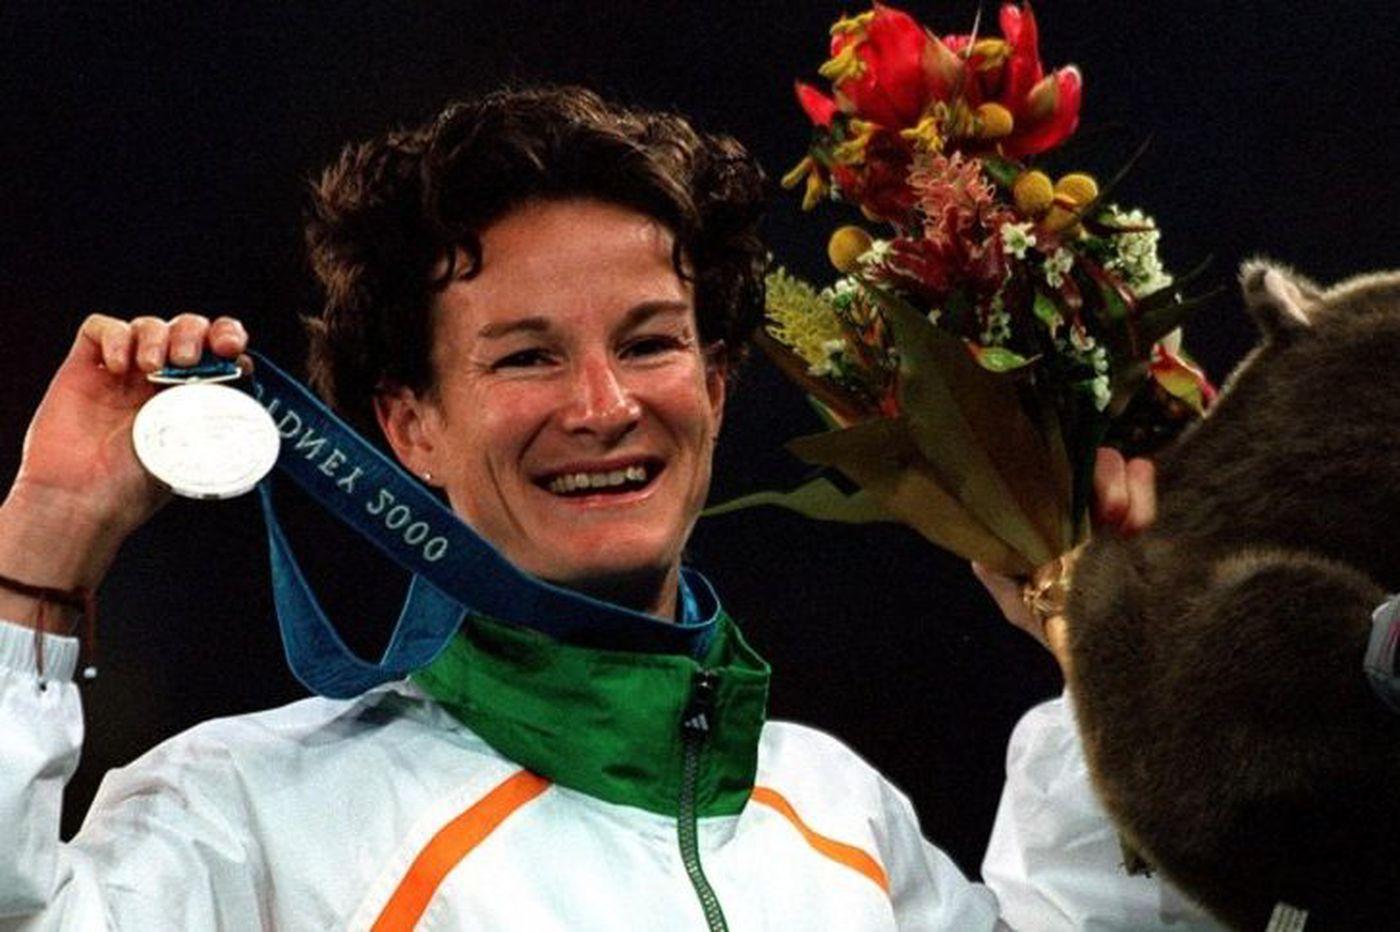 Sonia O'Sullivan ran from Villanova to iconic status